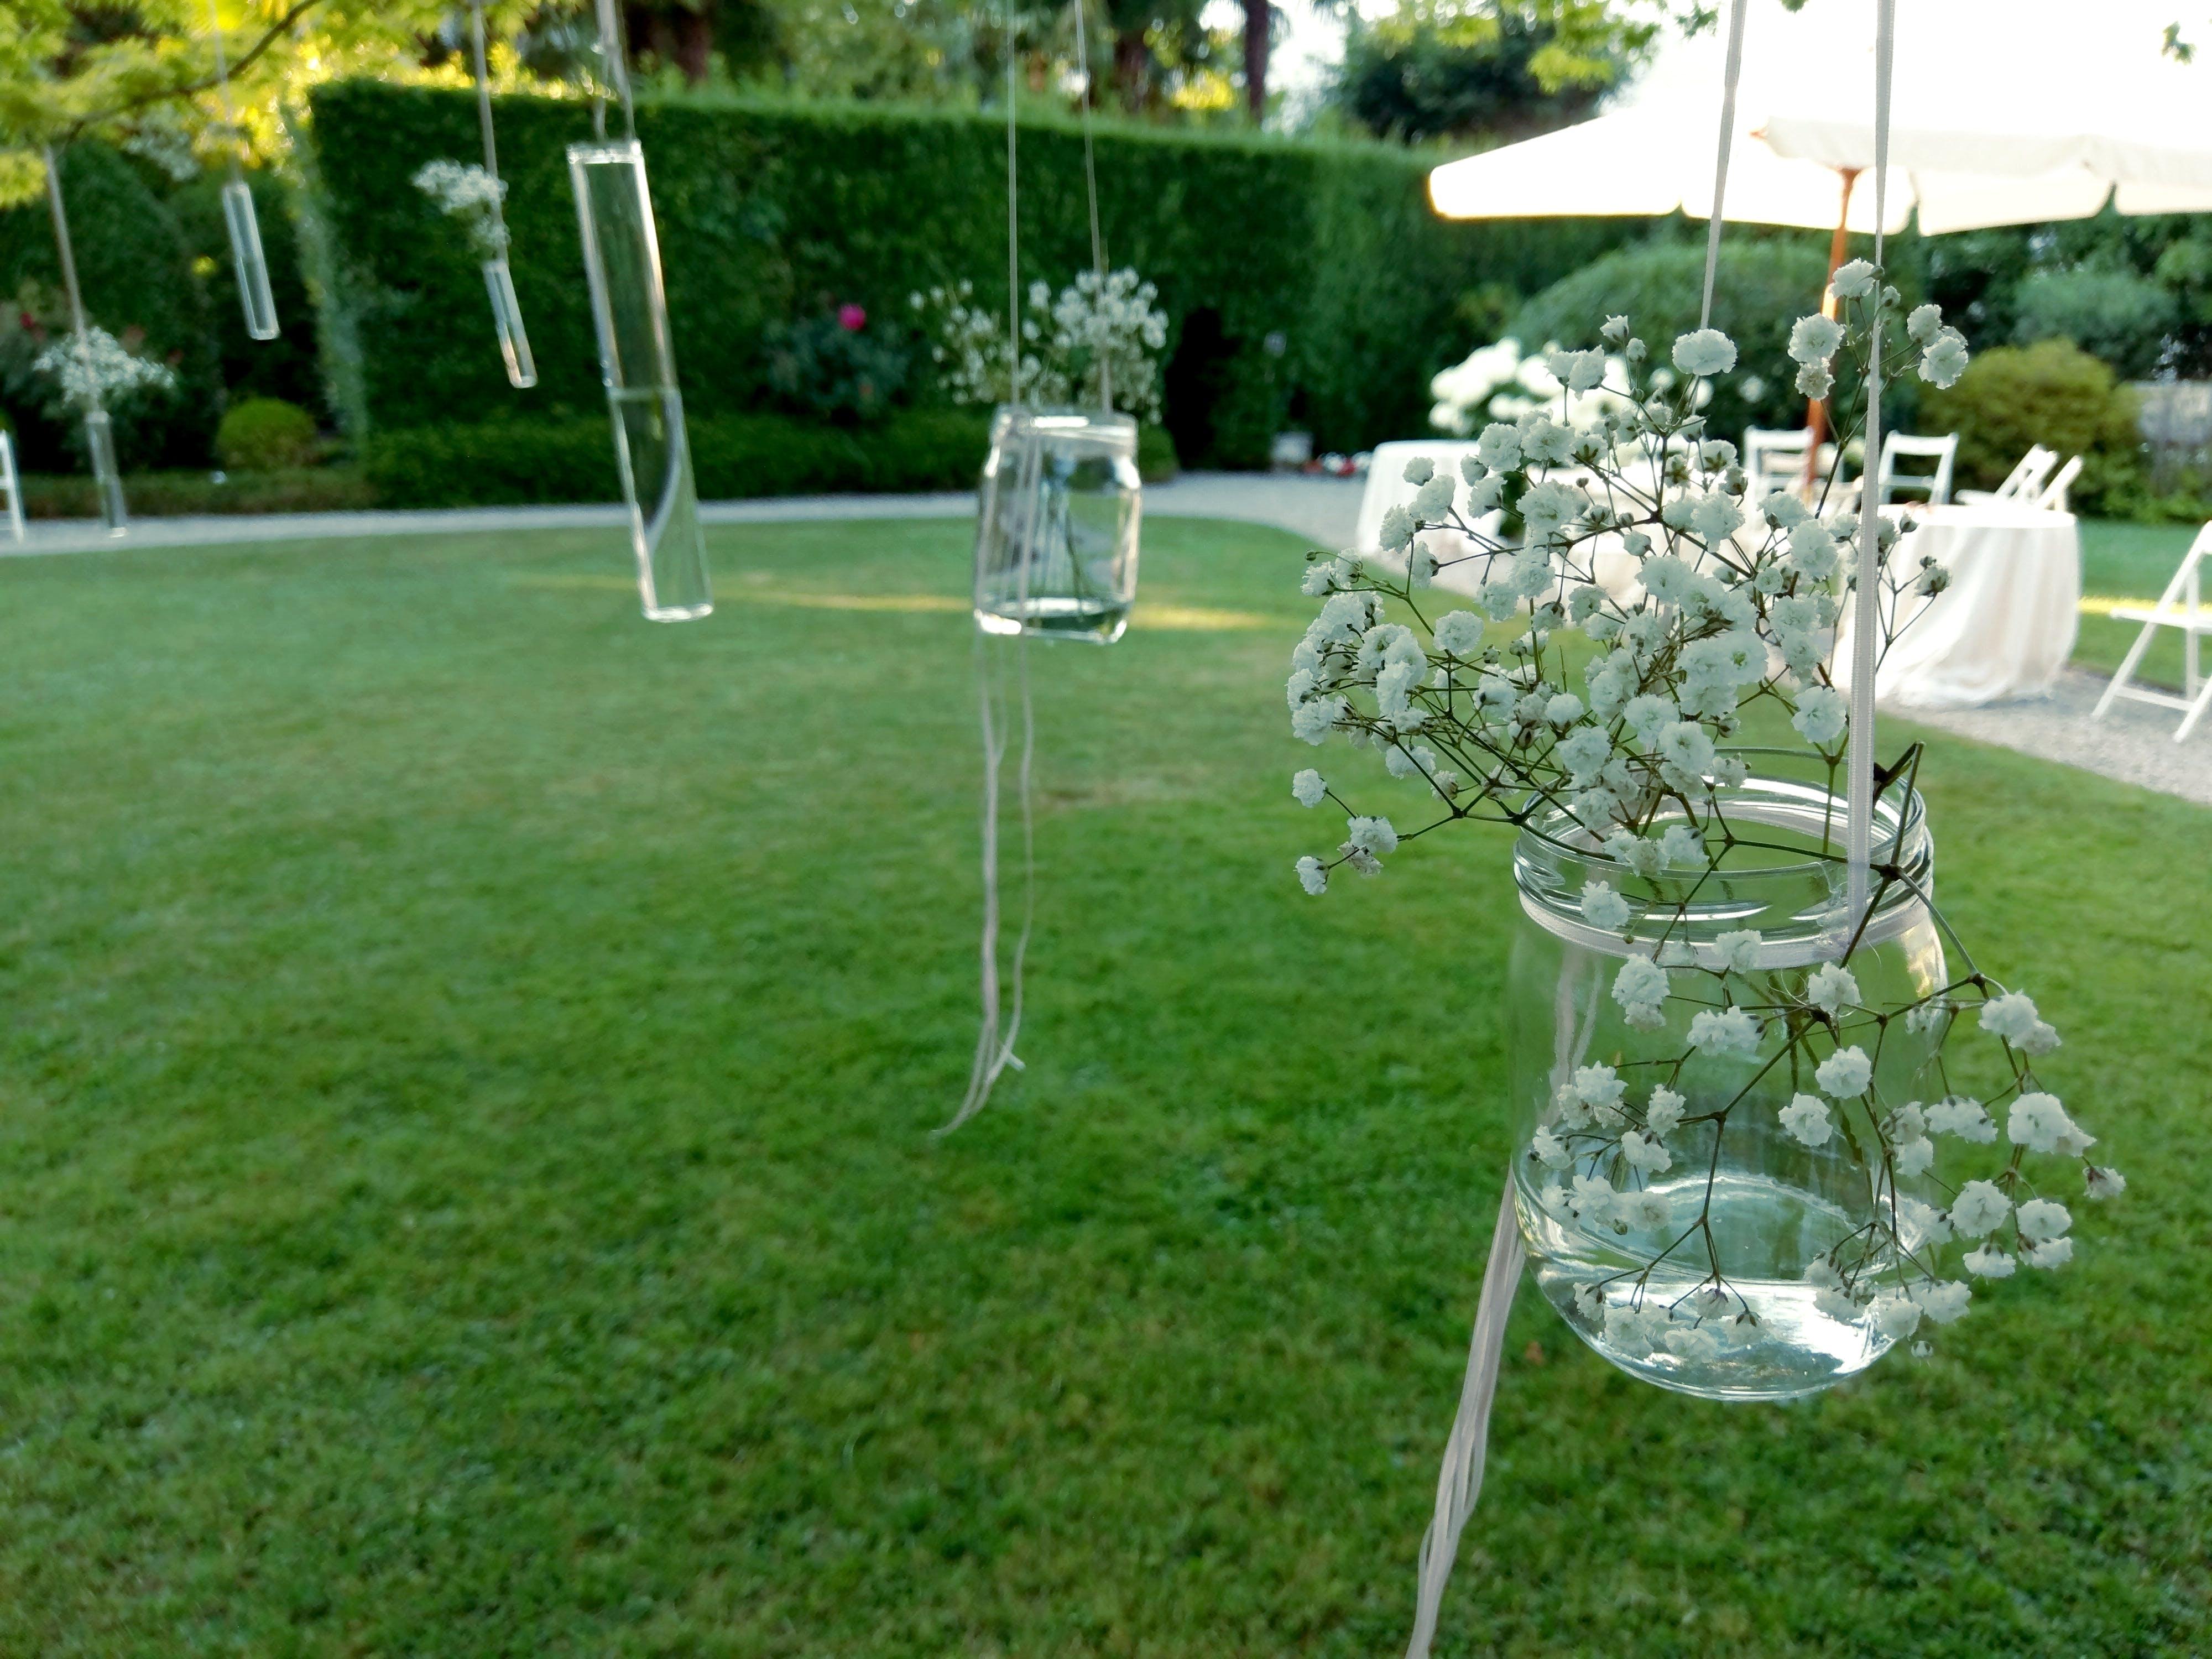 Free stock photo of flowers, grass, glass jar